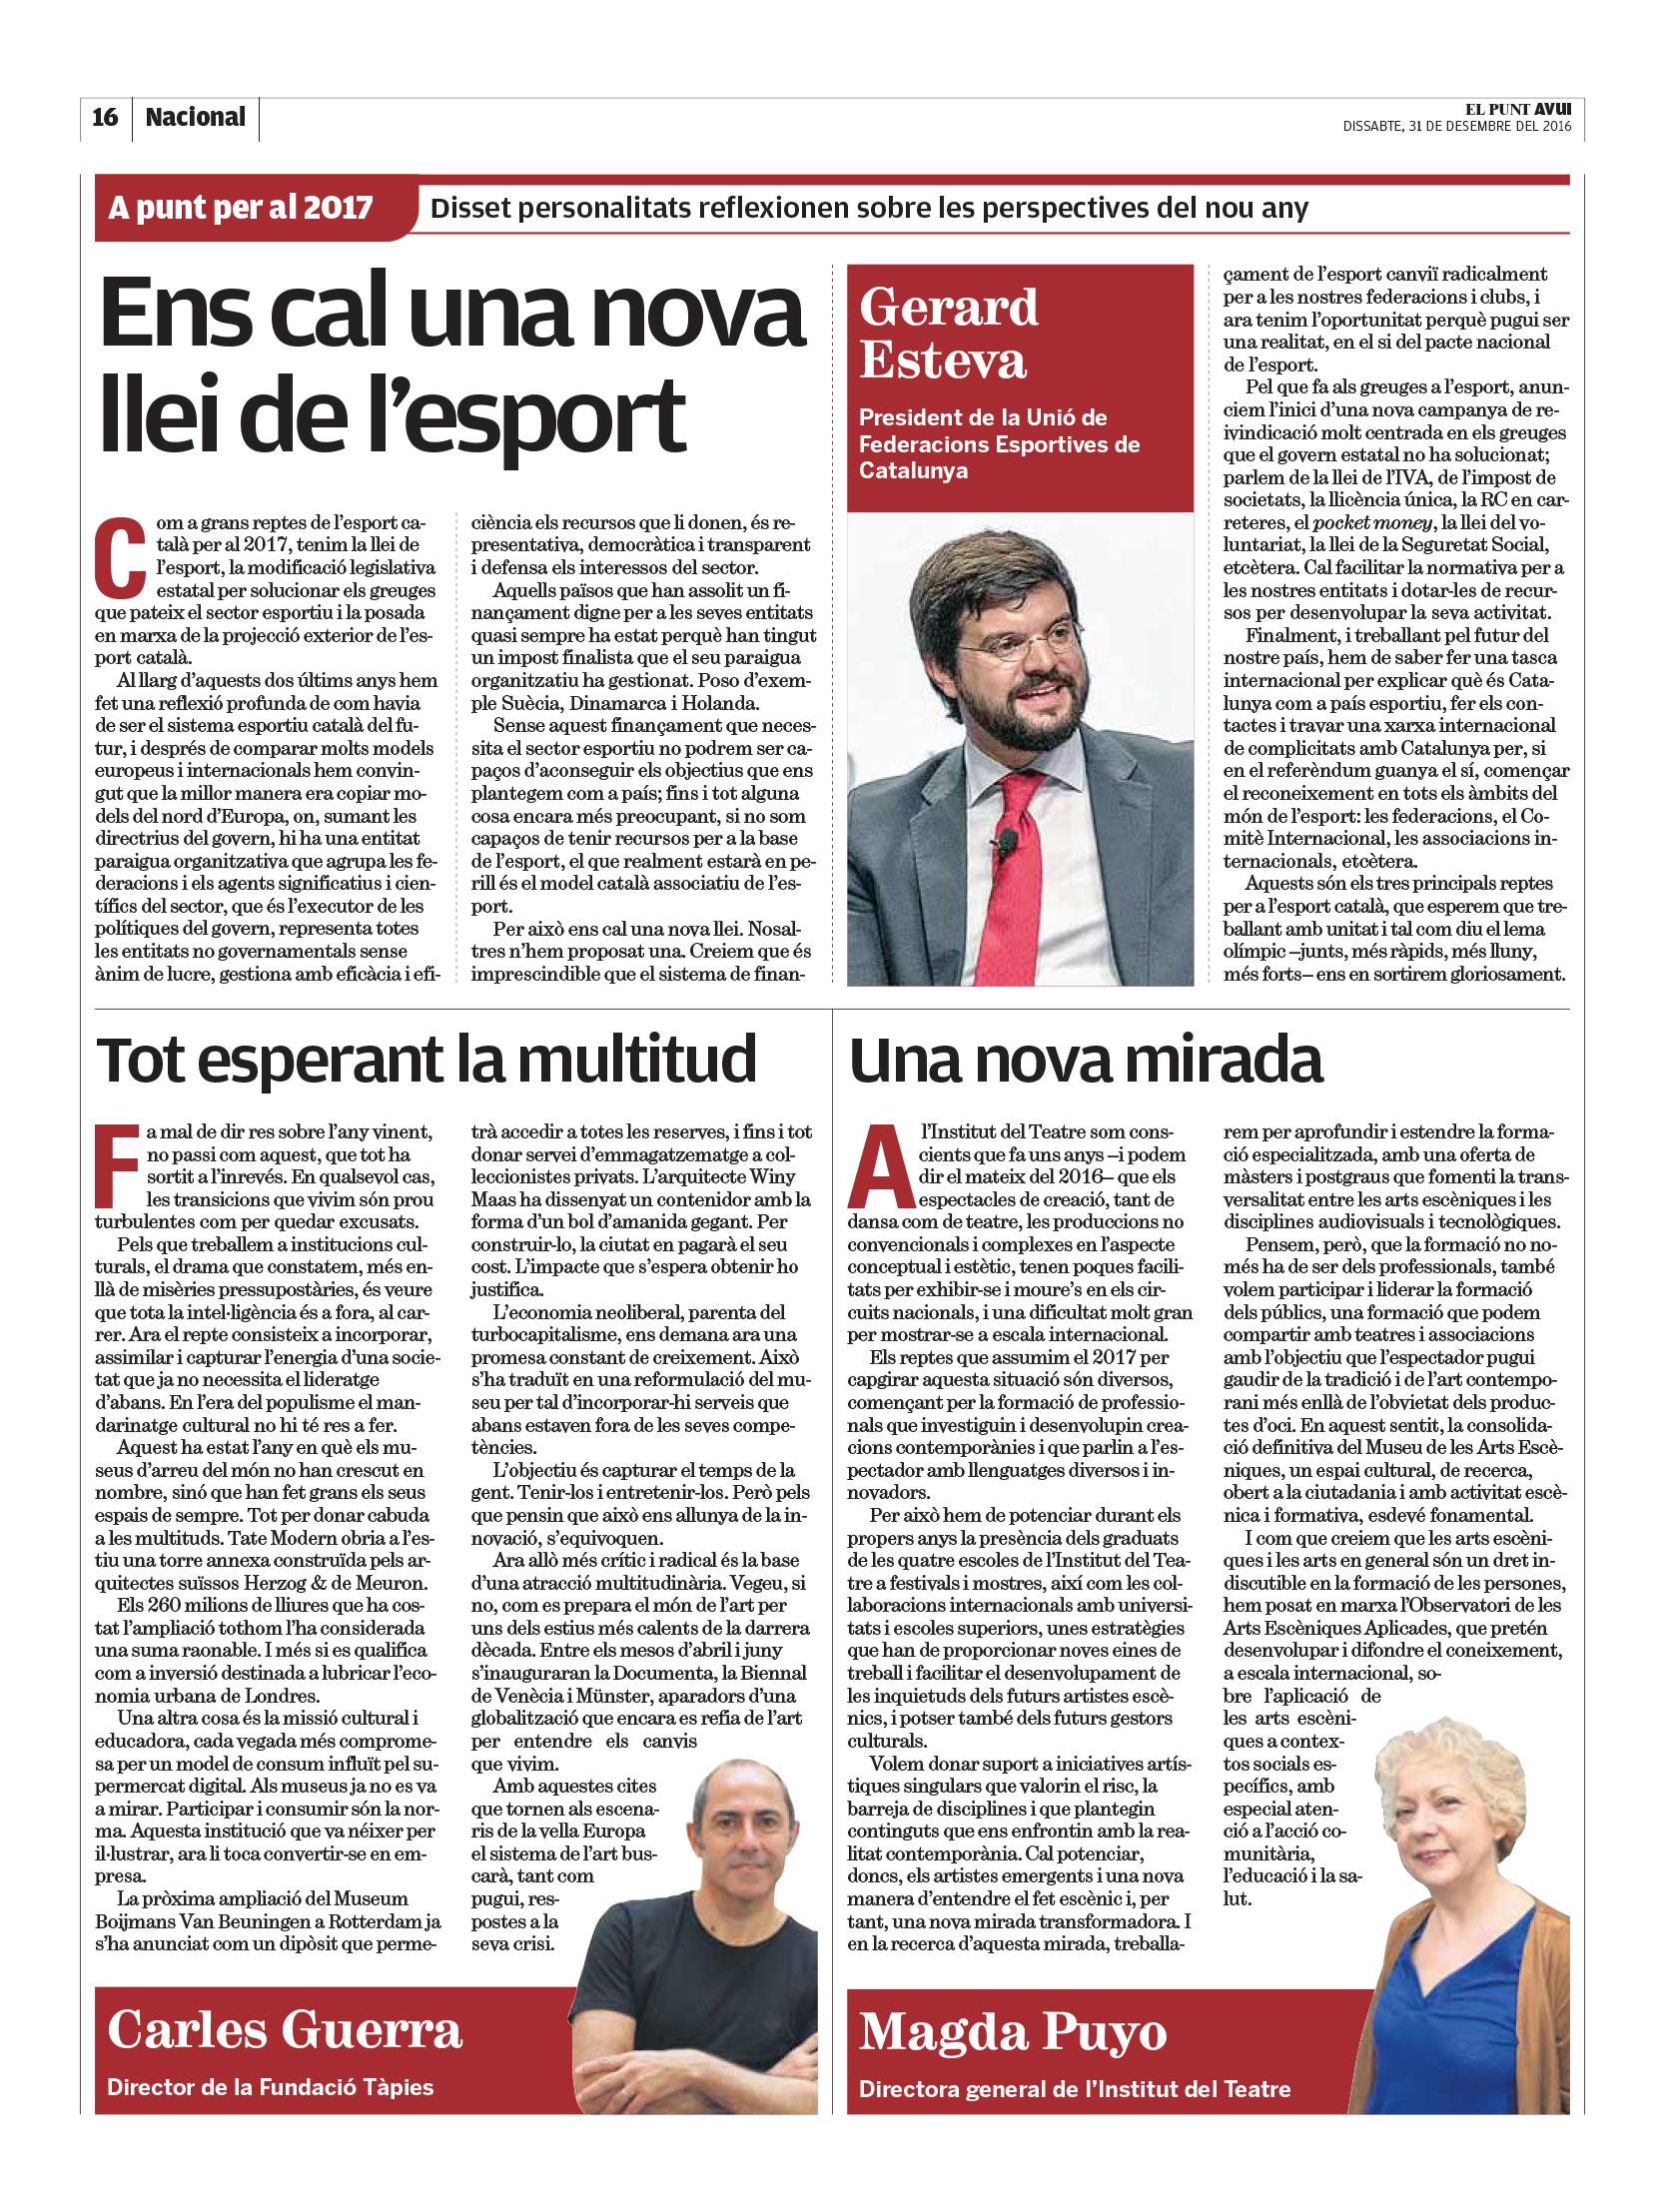 opinio llei de l'esport_elpunt_02-01-2017